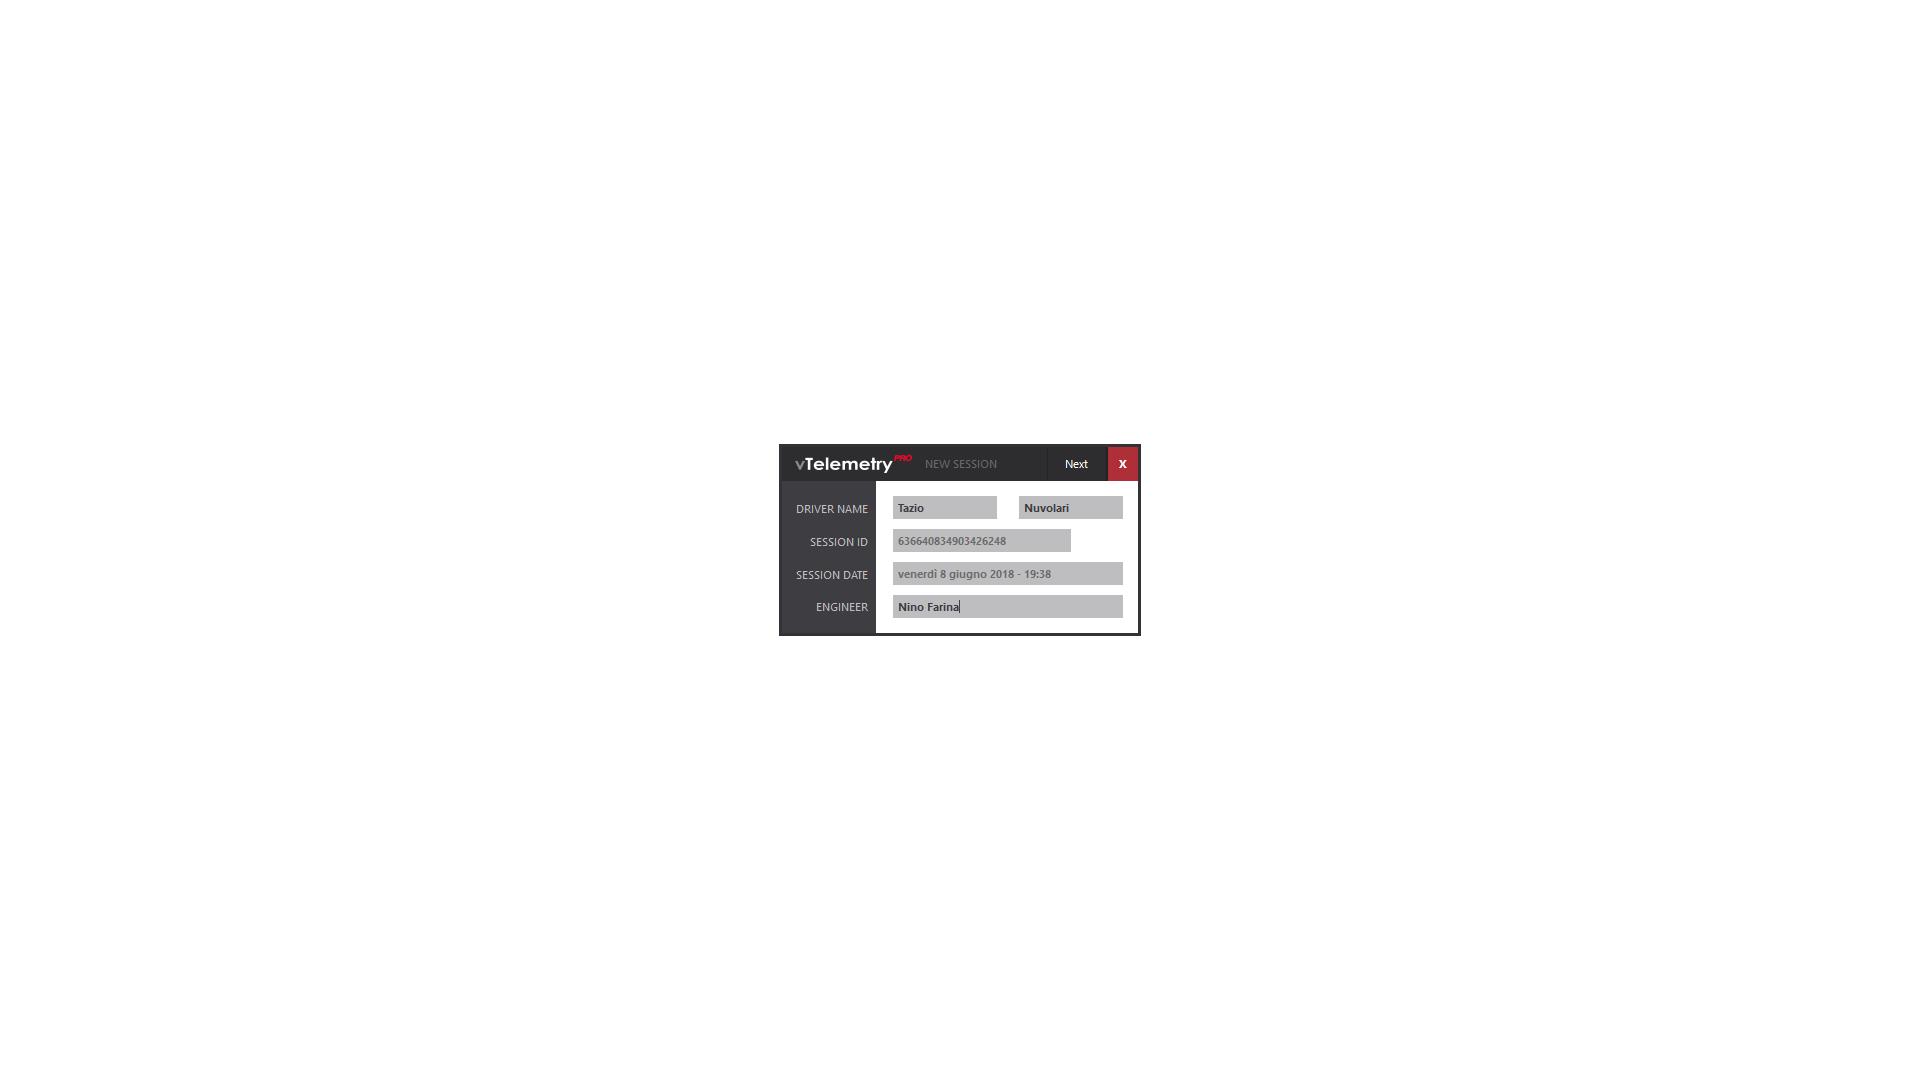 vTelemetry PRO 2018 Software License (Non-Commercial)